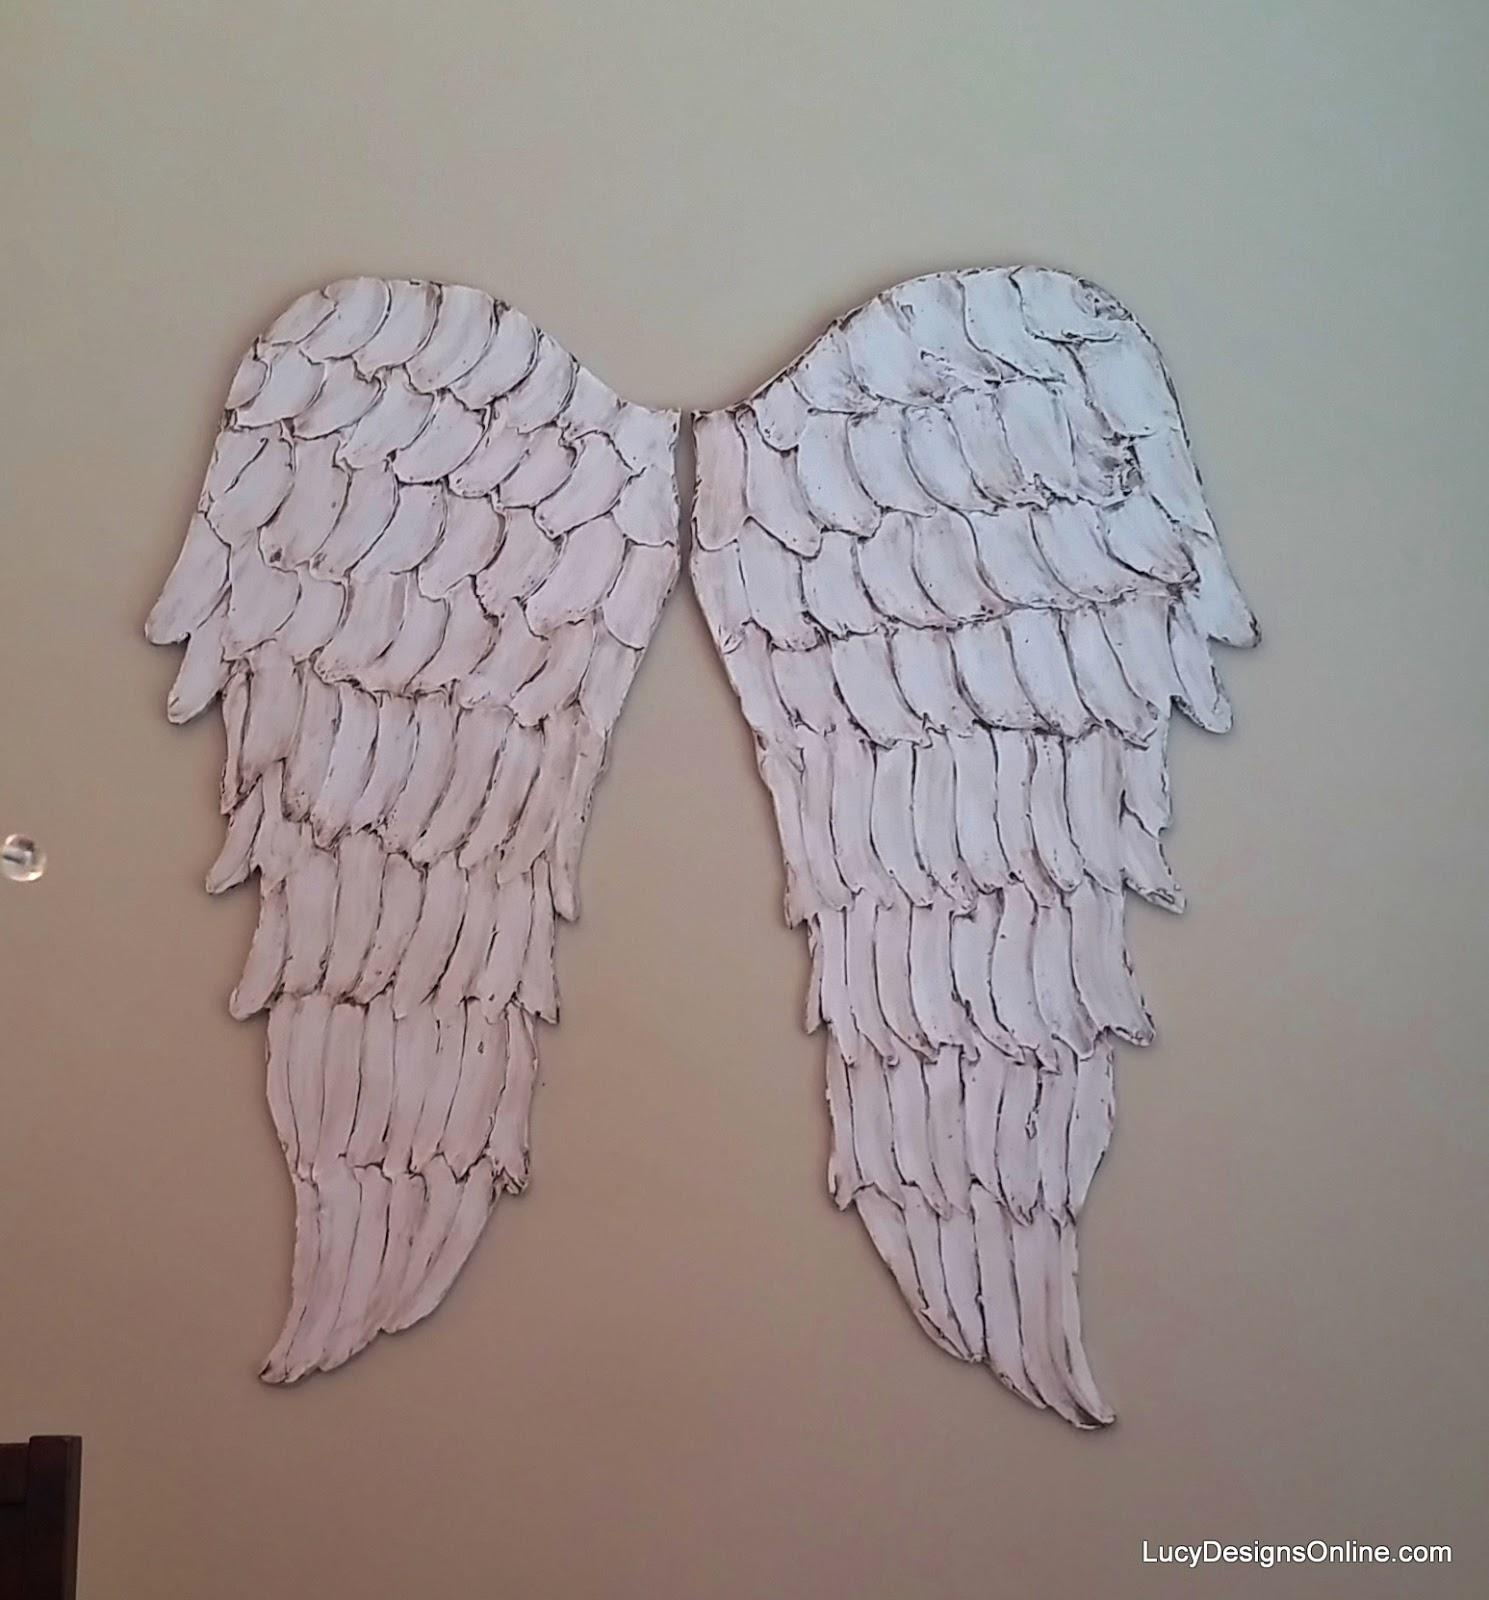 Wood Angel Wings Wall Art, Large Carved Look Wooden Angel Wings Throughout Angel Wing Wall Art (Image 20 of 20)